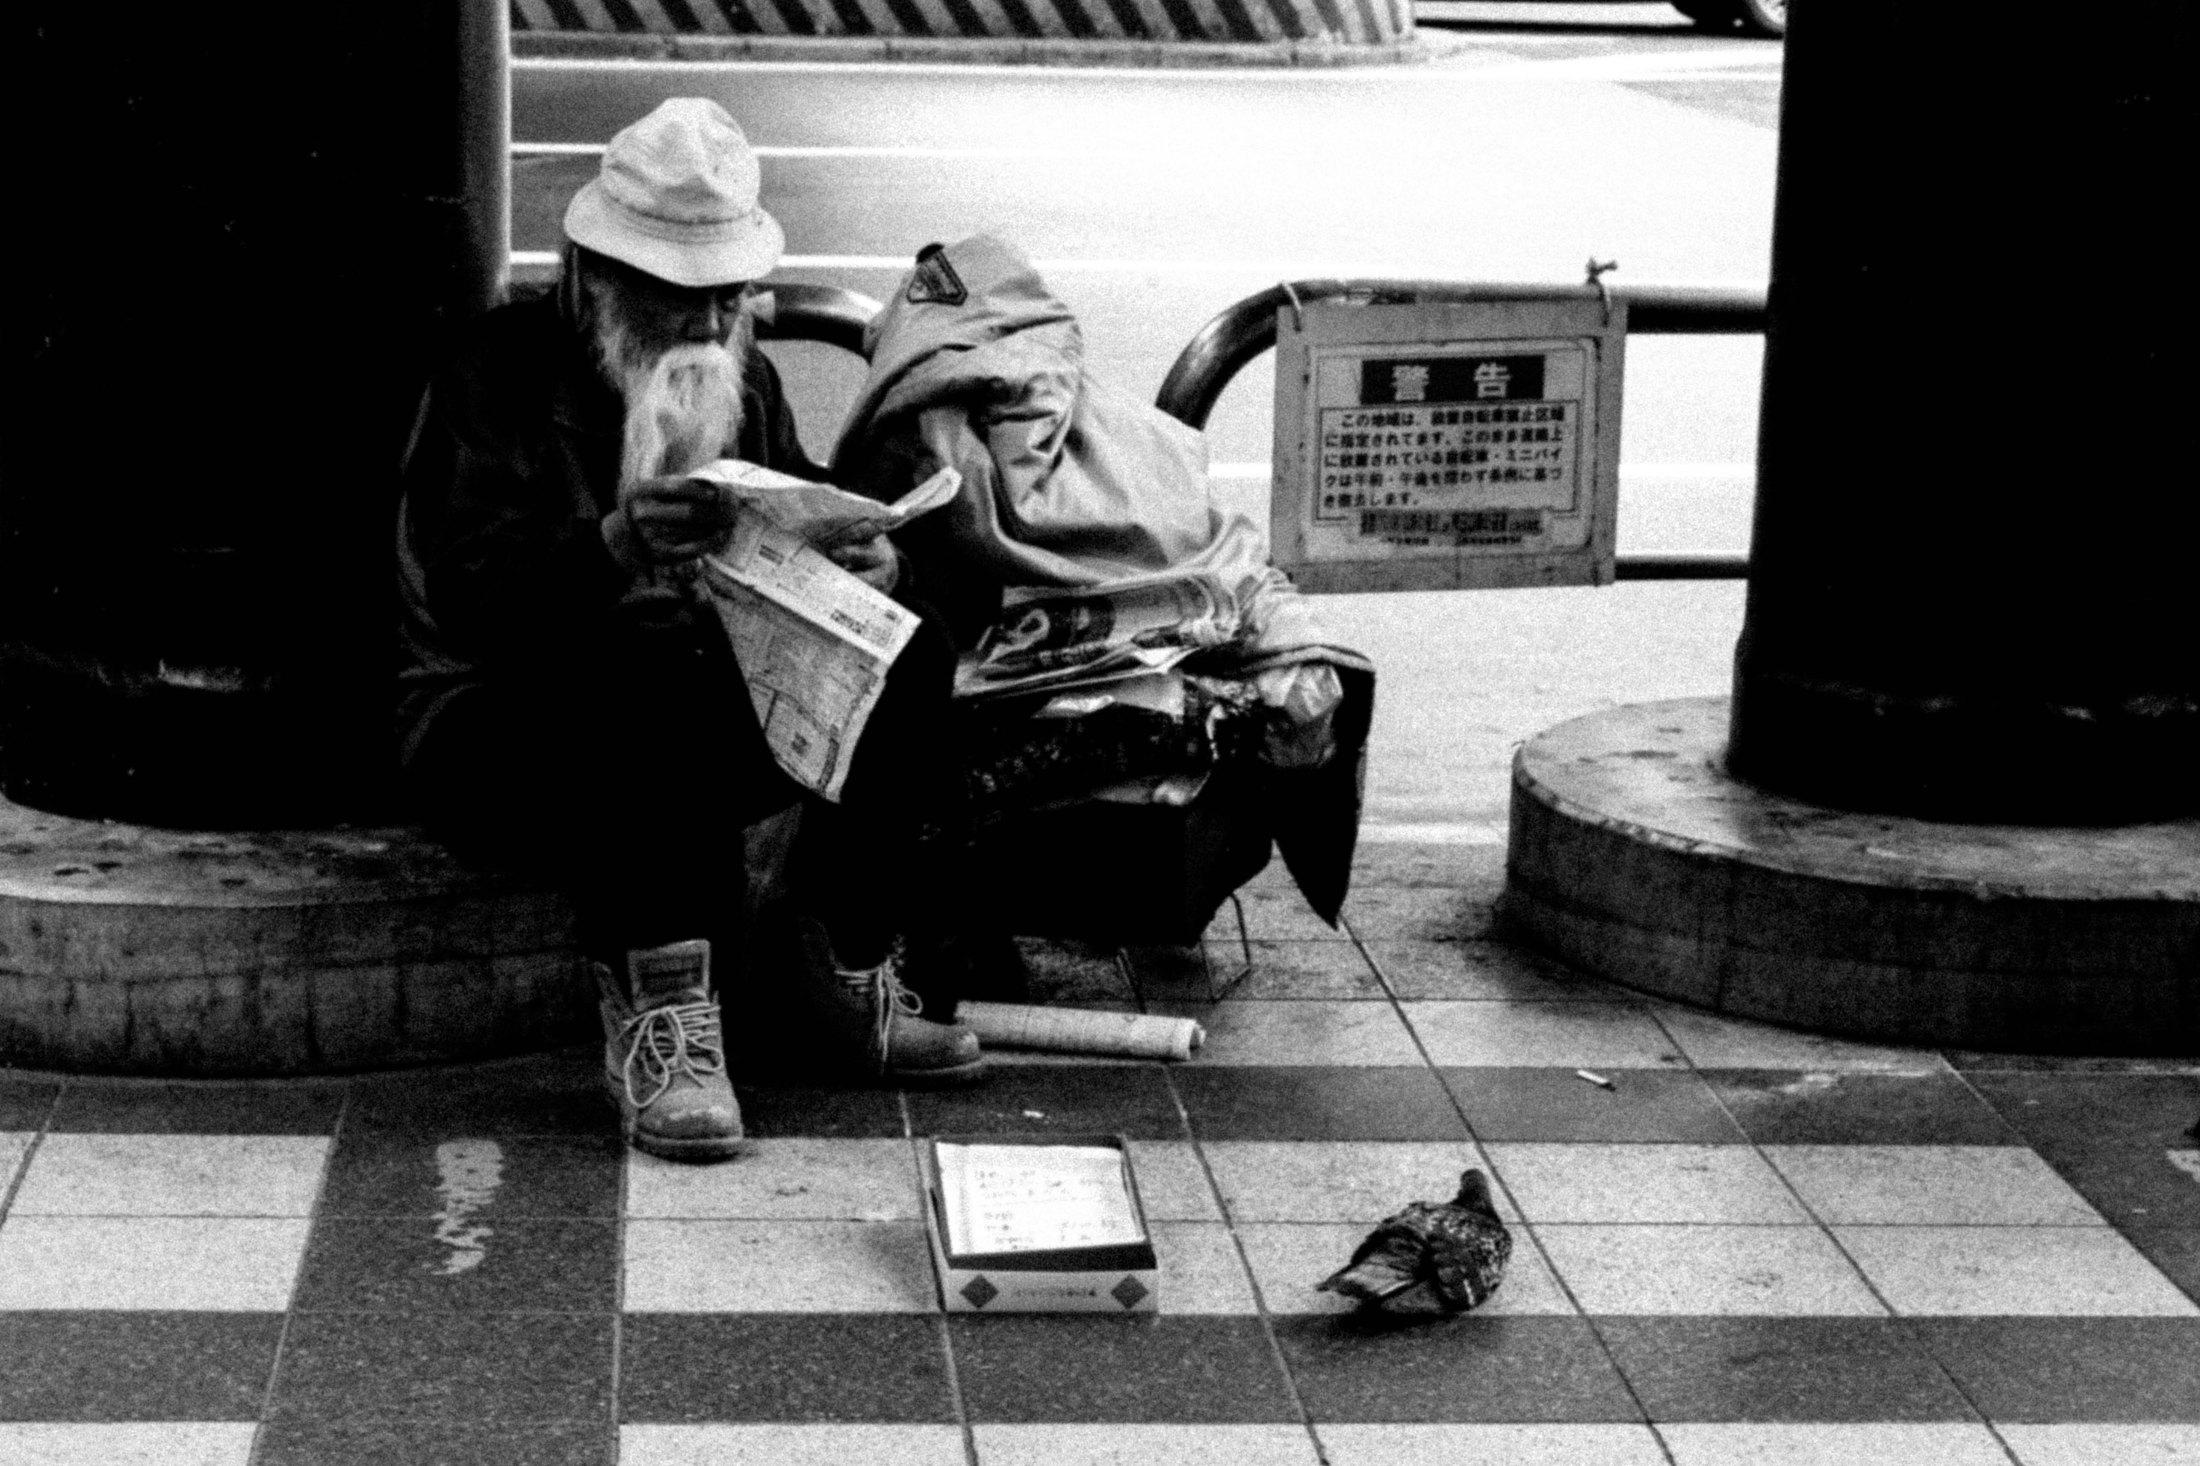 Street photowalk in Umeda